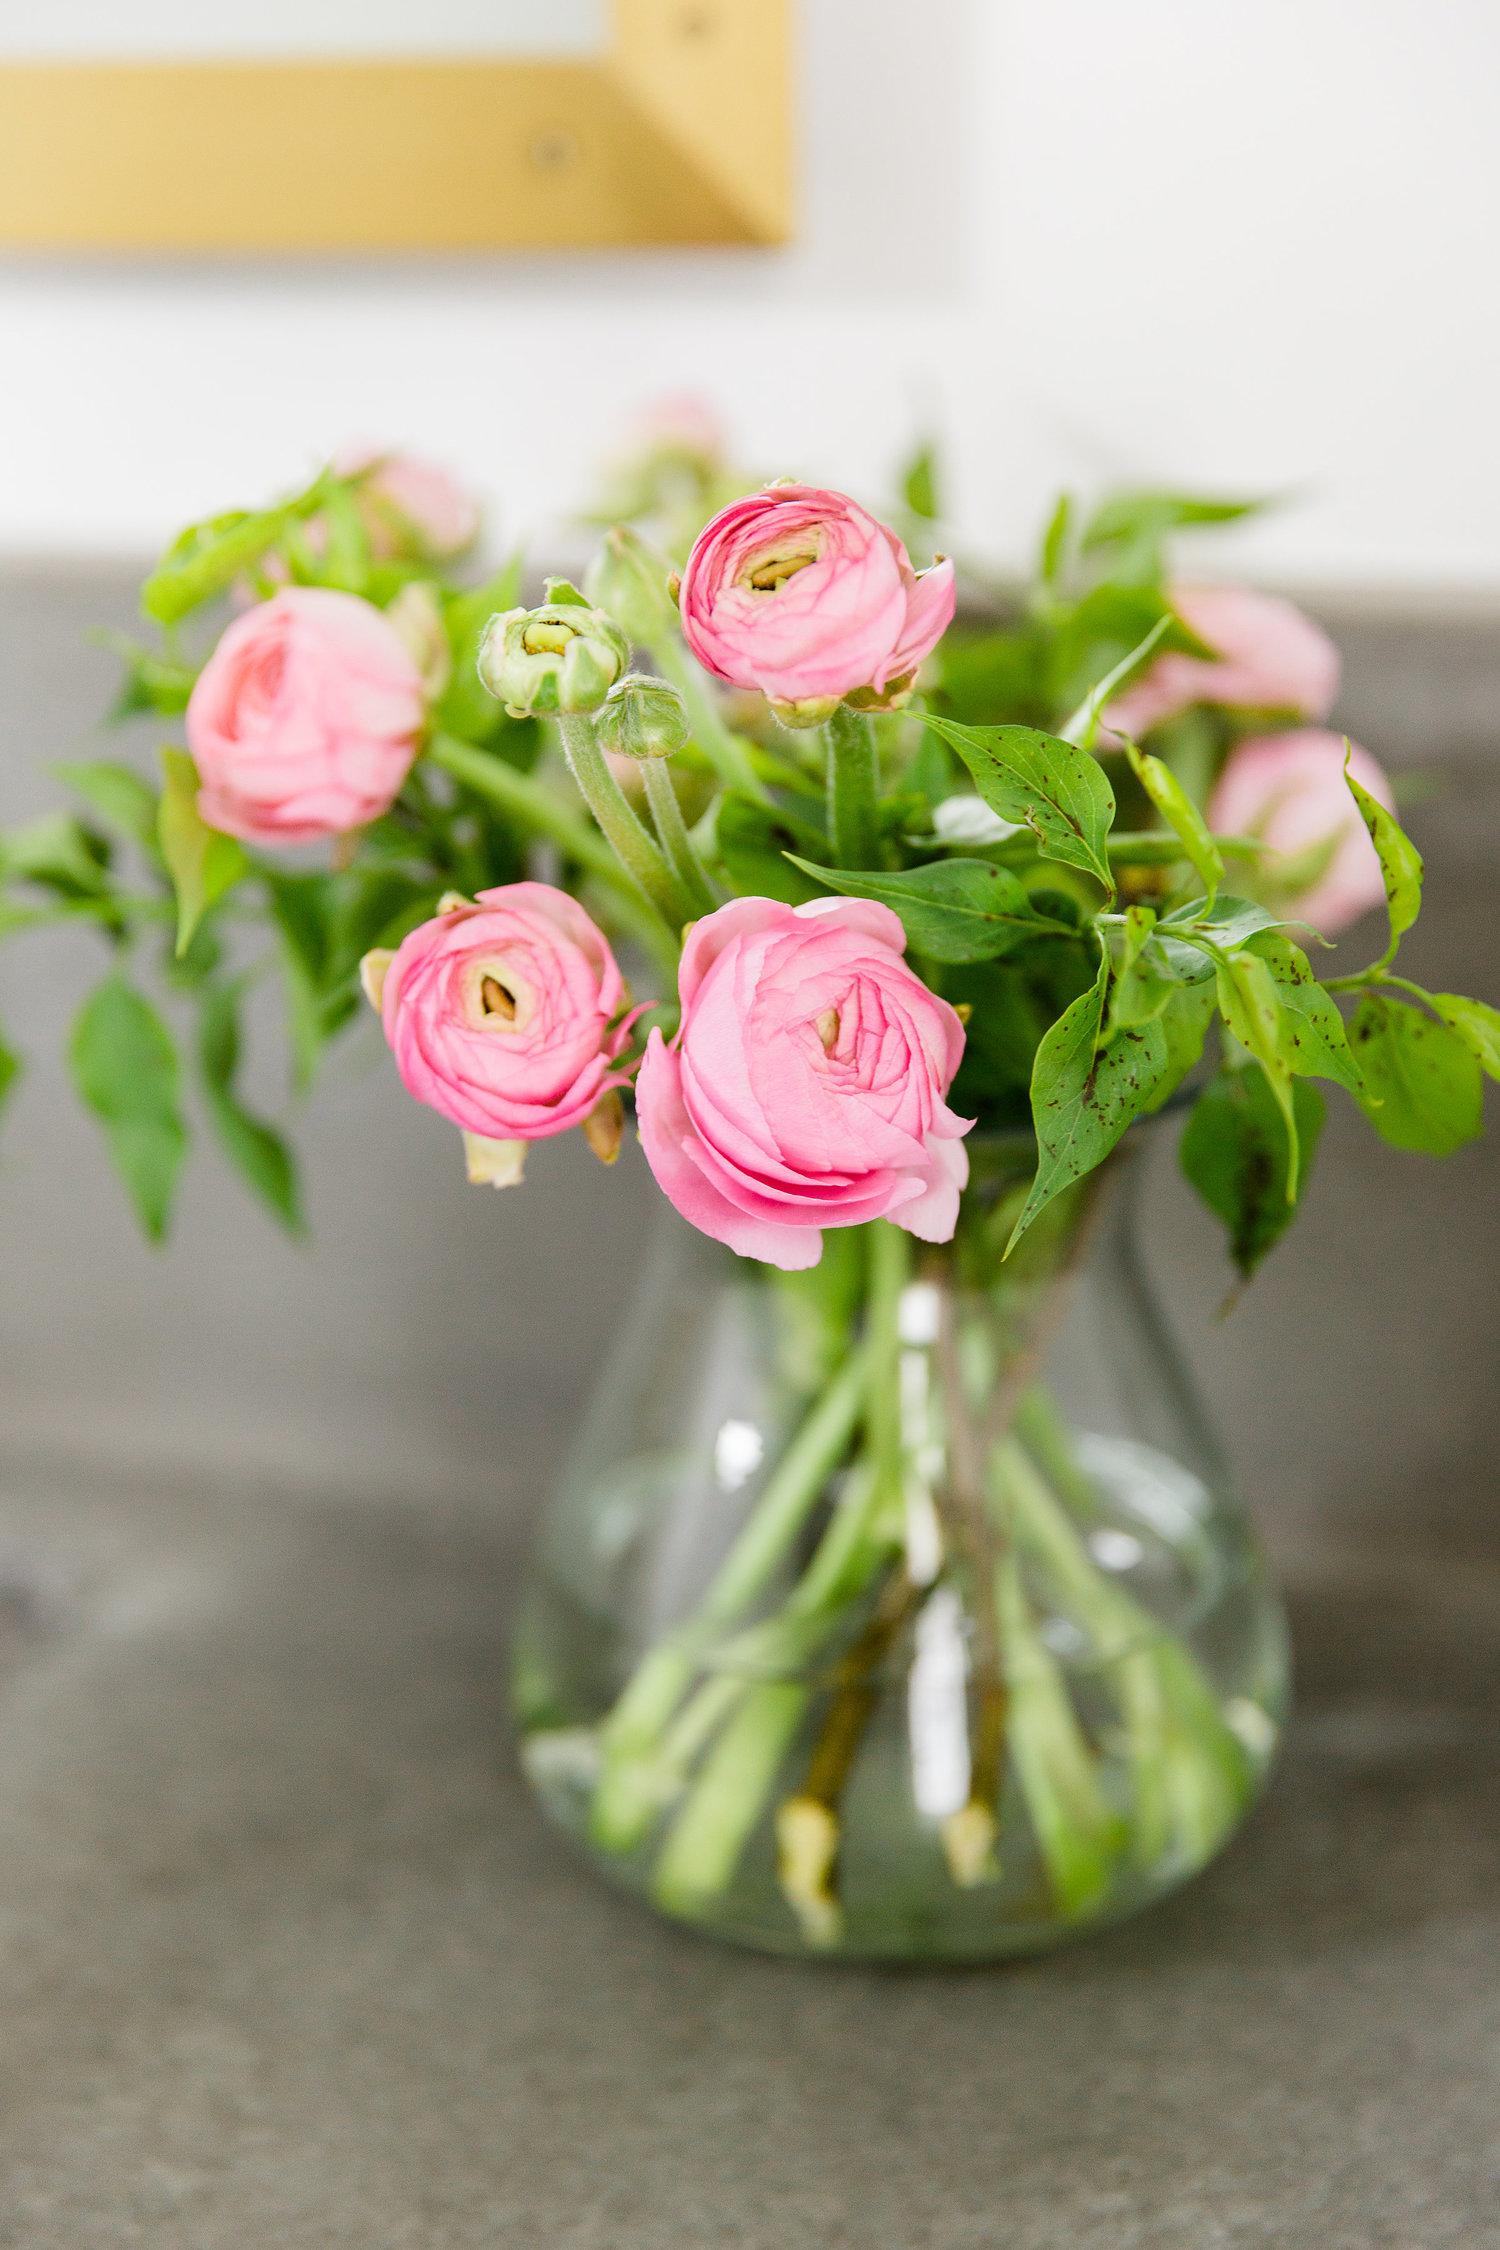 Flowers on bathroom vanity